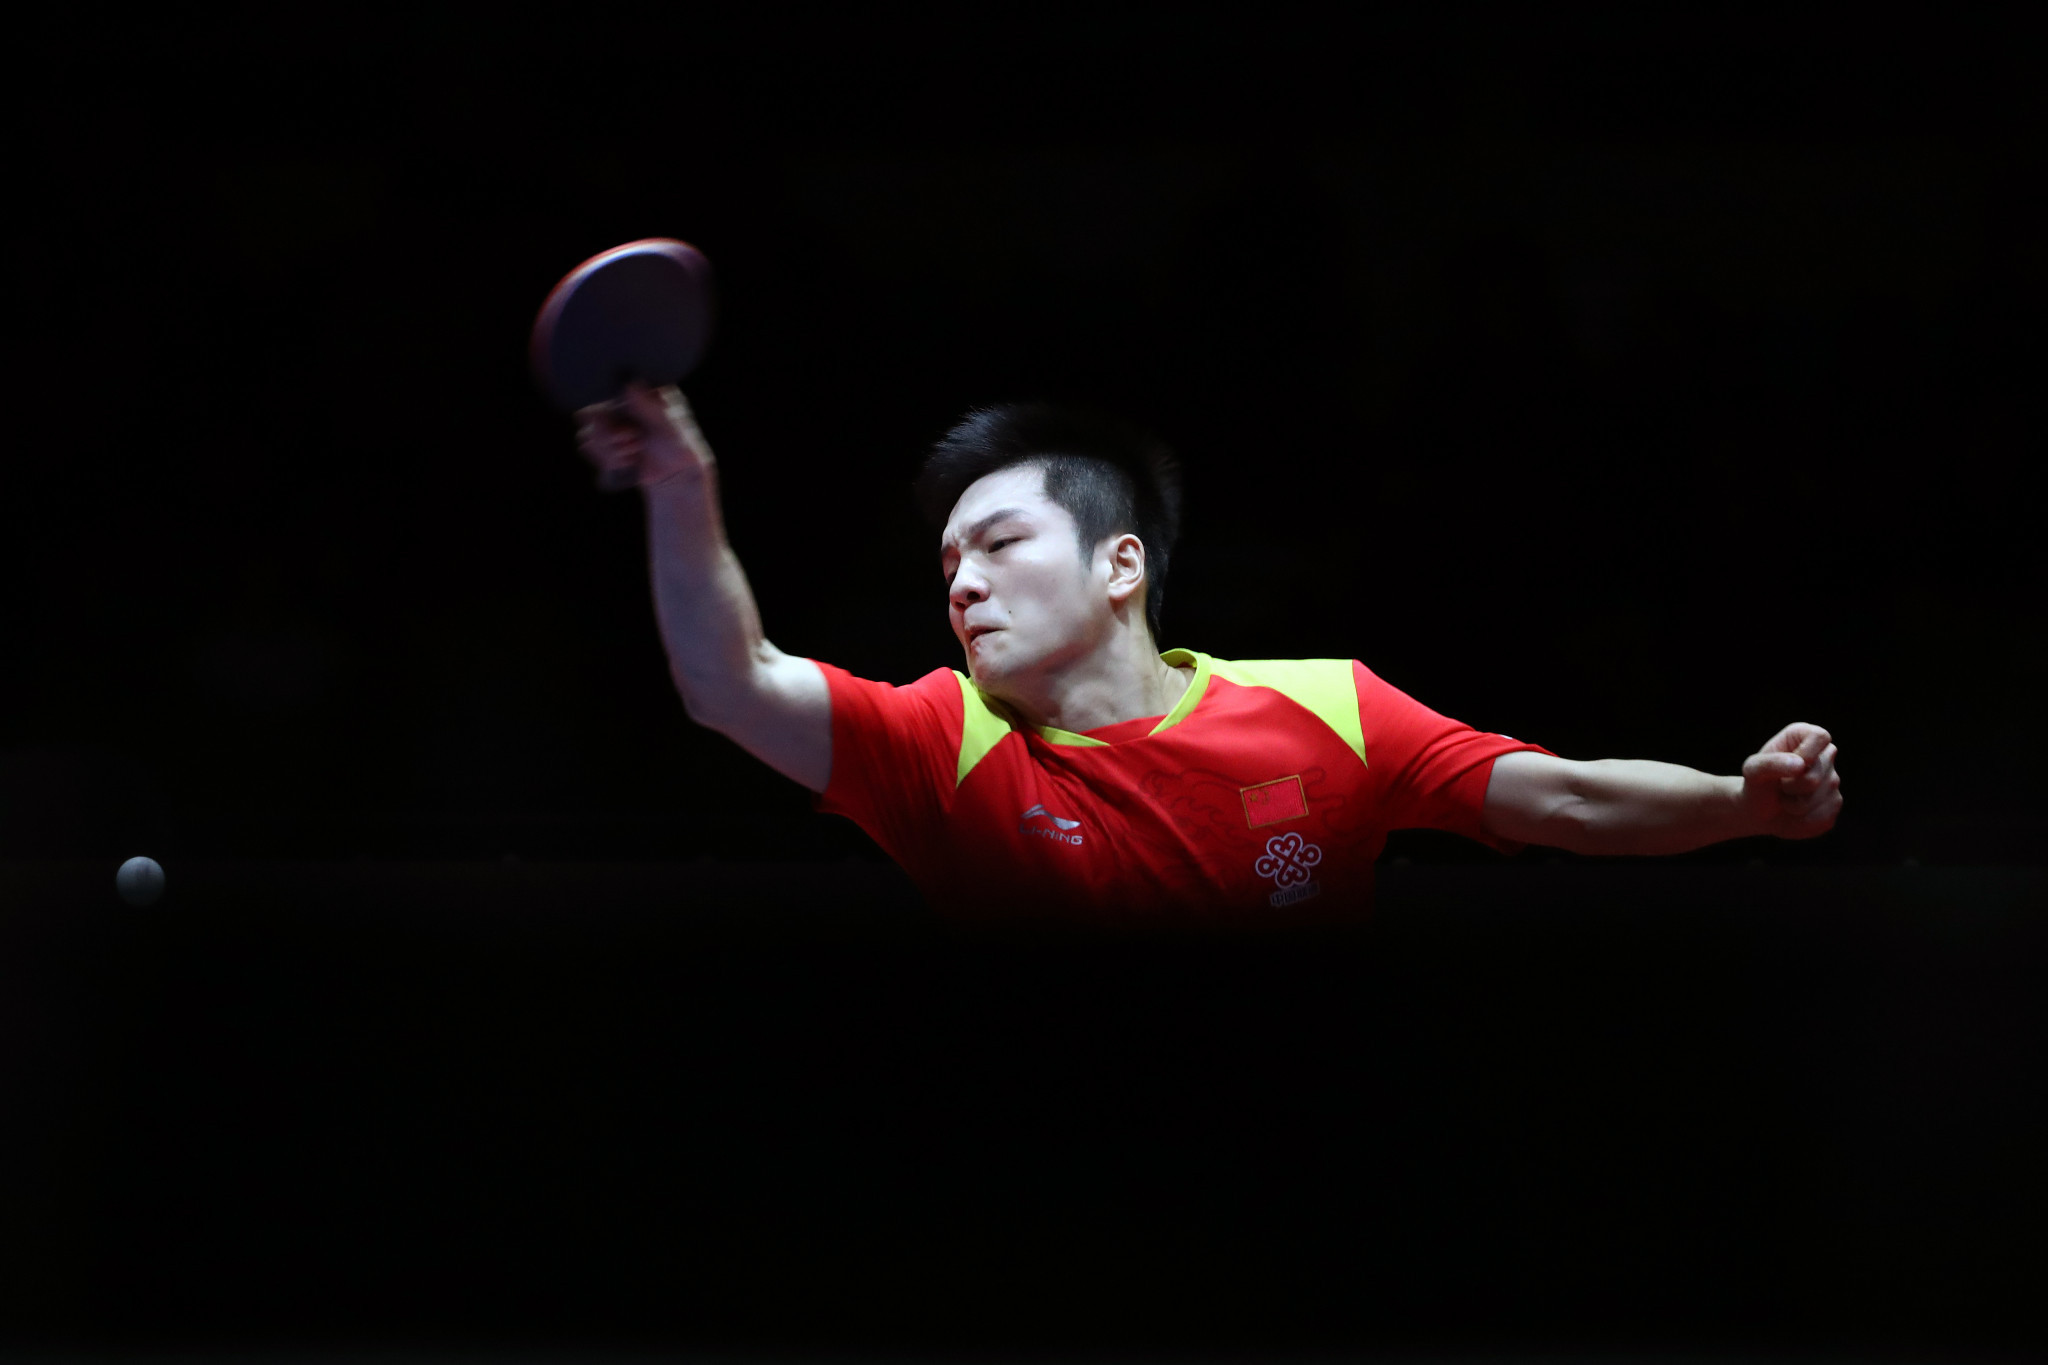 Fan Zhendong defended his men's title in Yokohama ©Getty Images